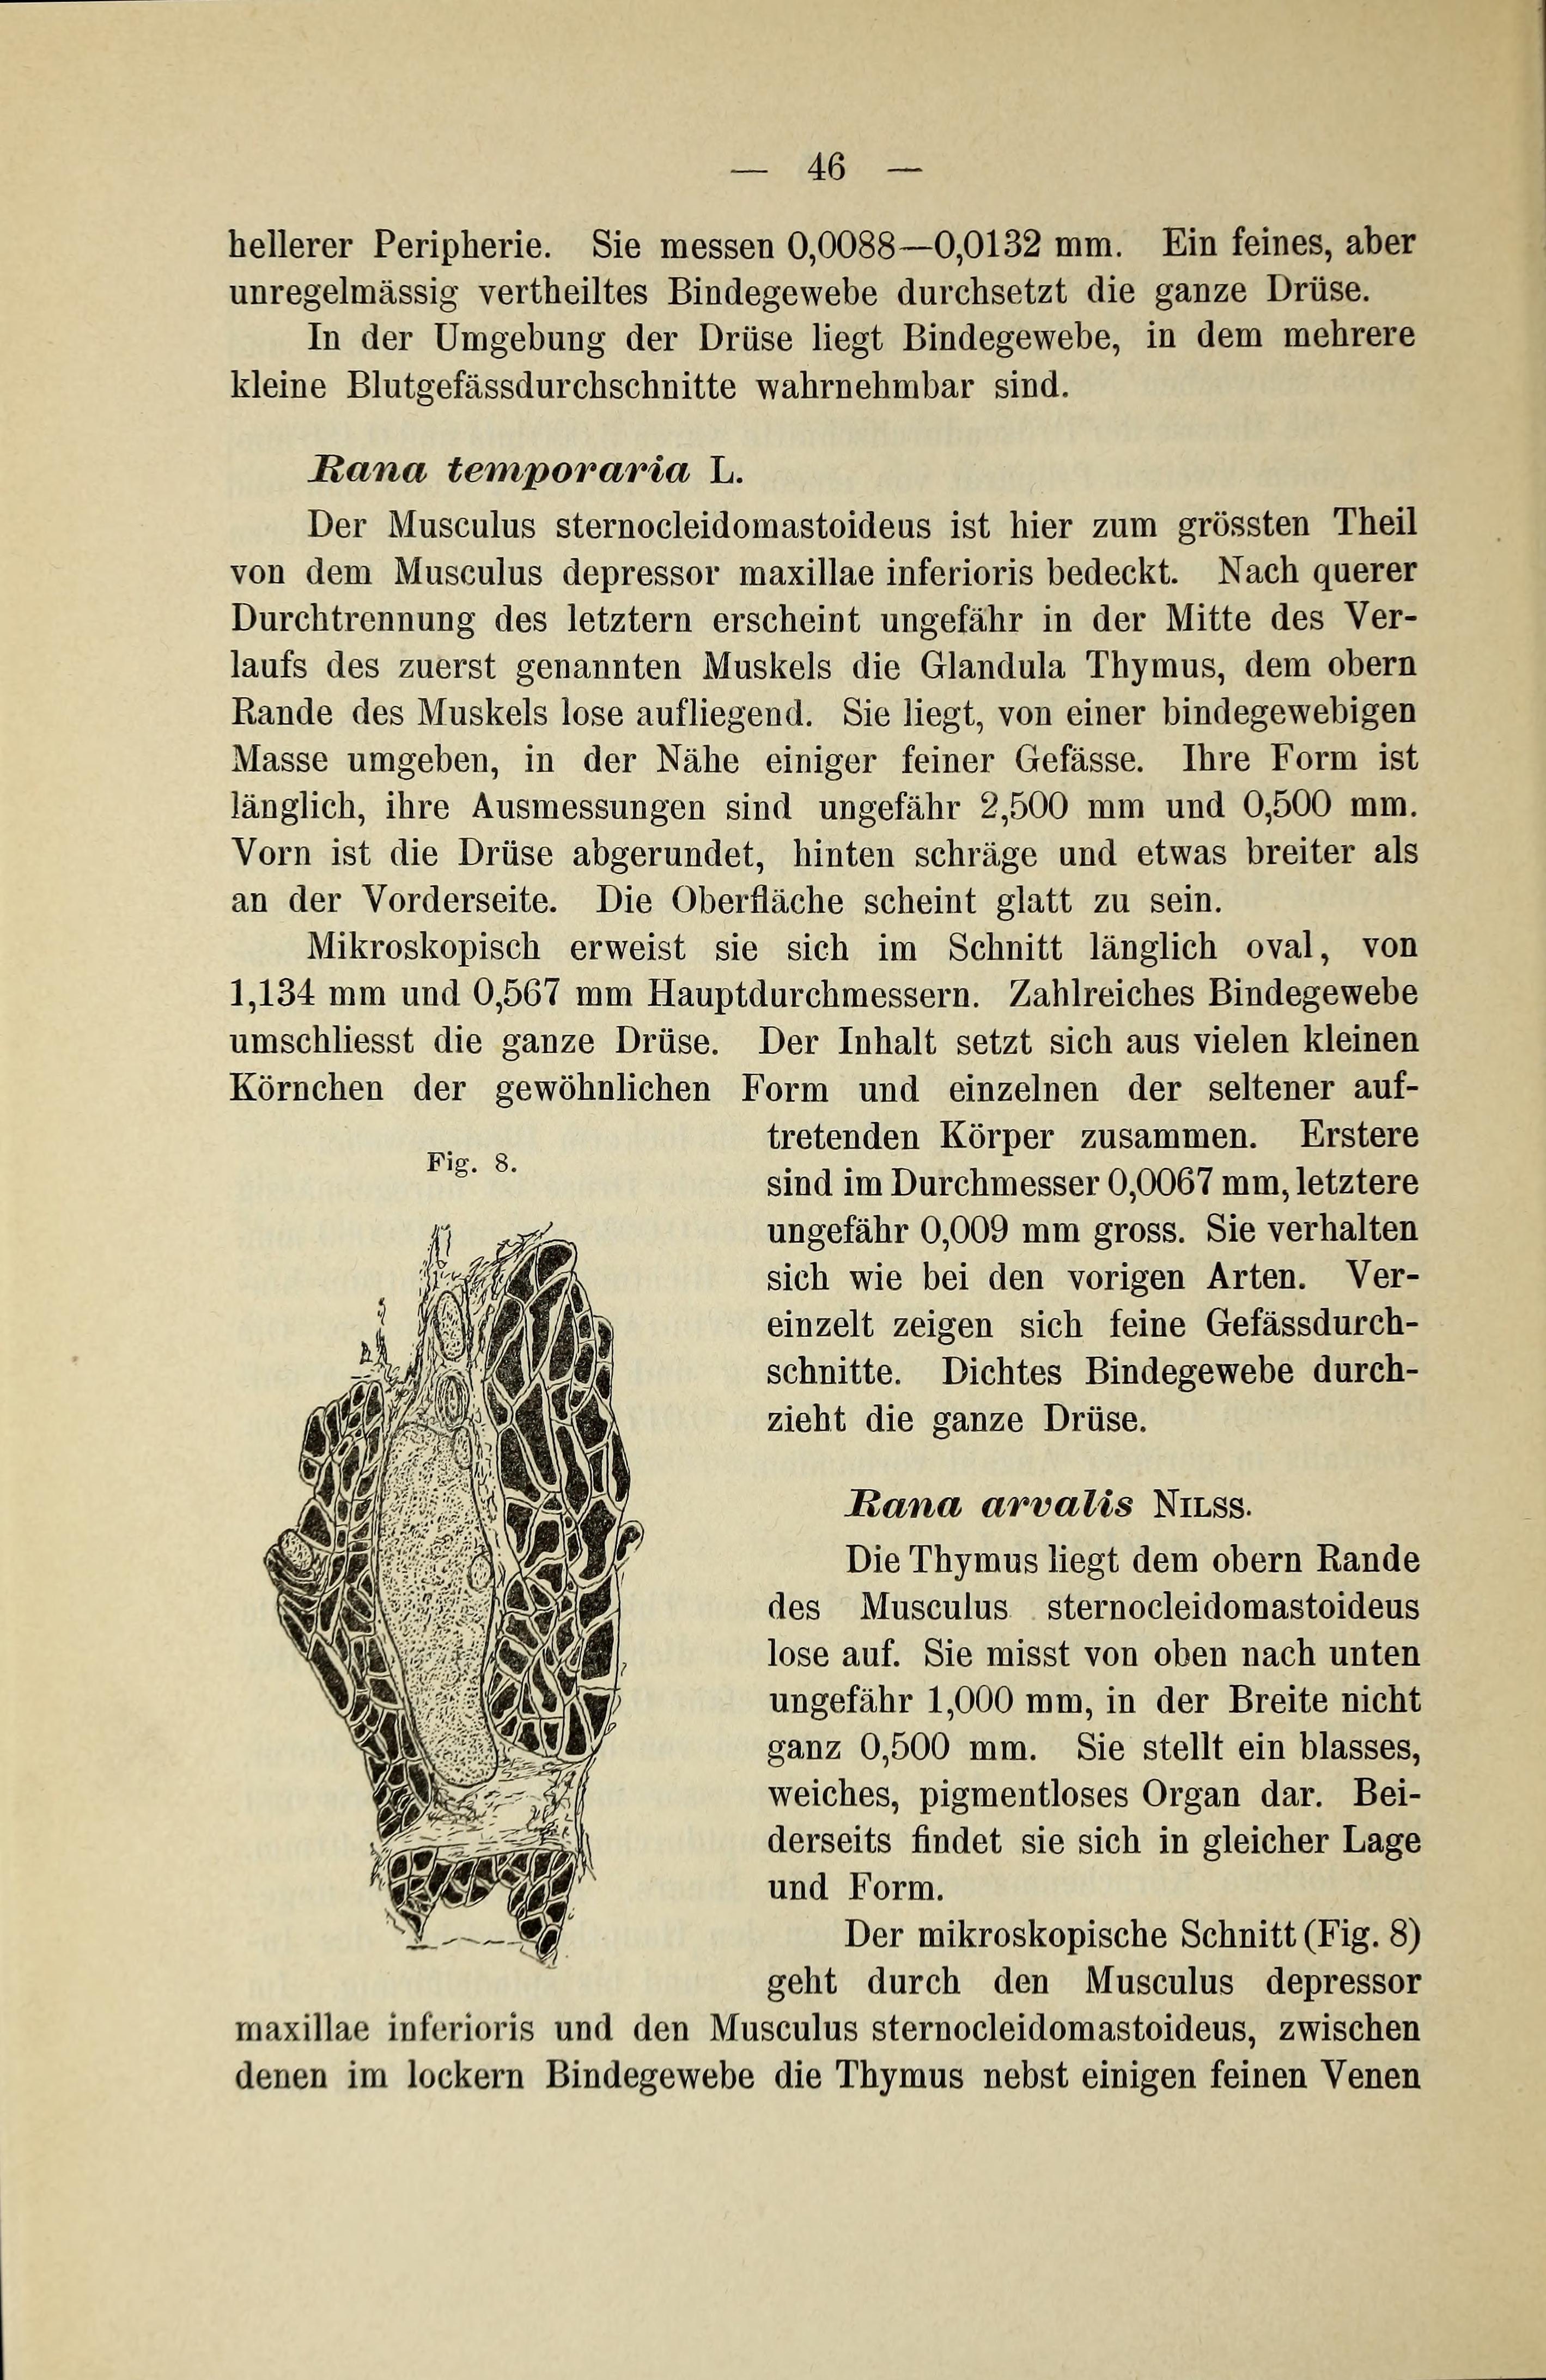 File:Glandula thyreoidea und Glandula Thymus der Amphibien (Page 46 ...